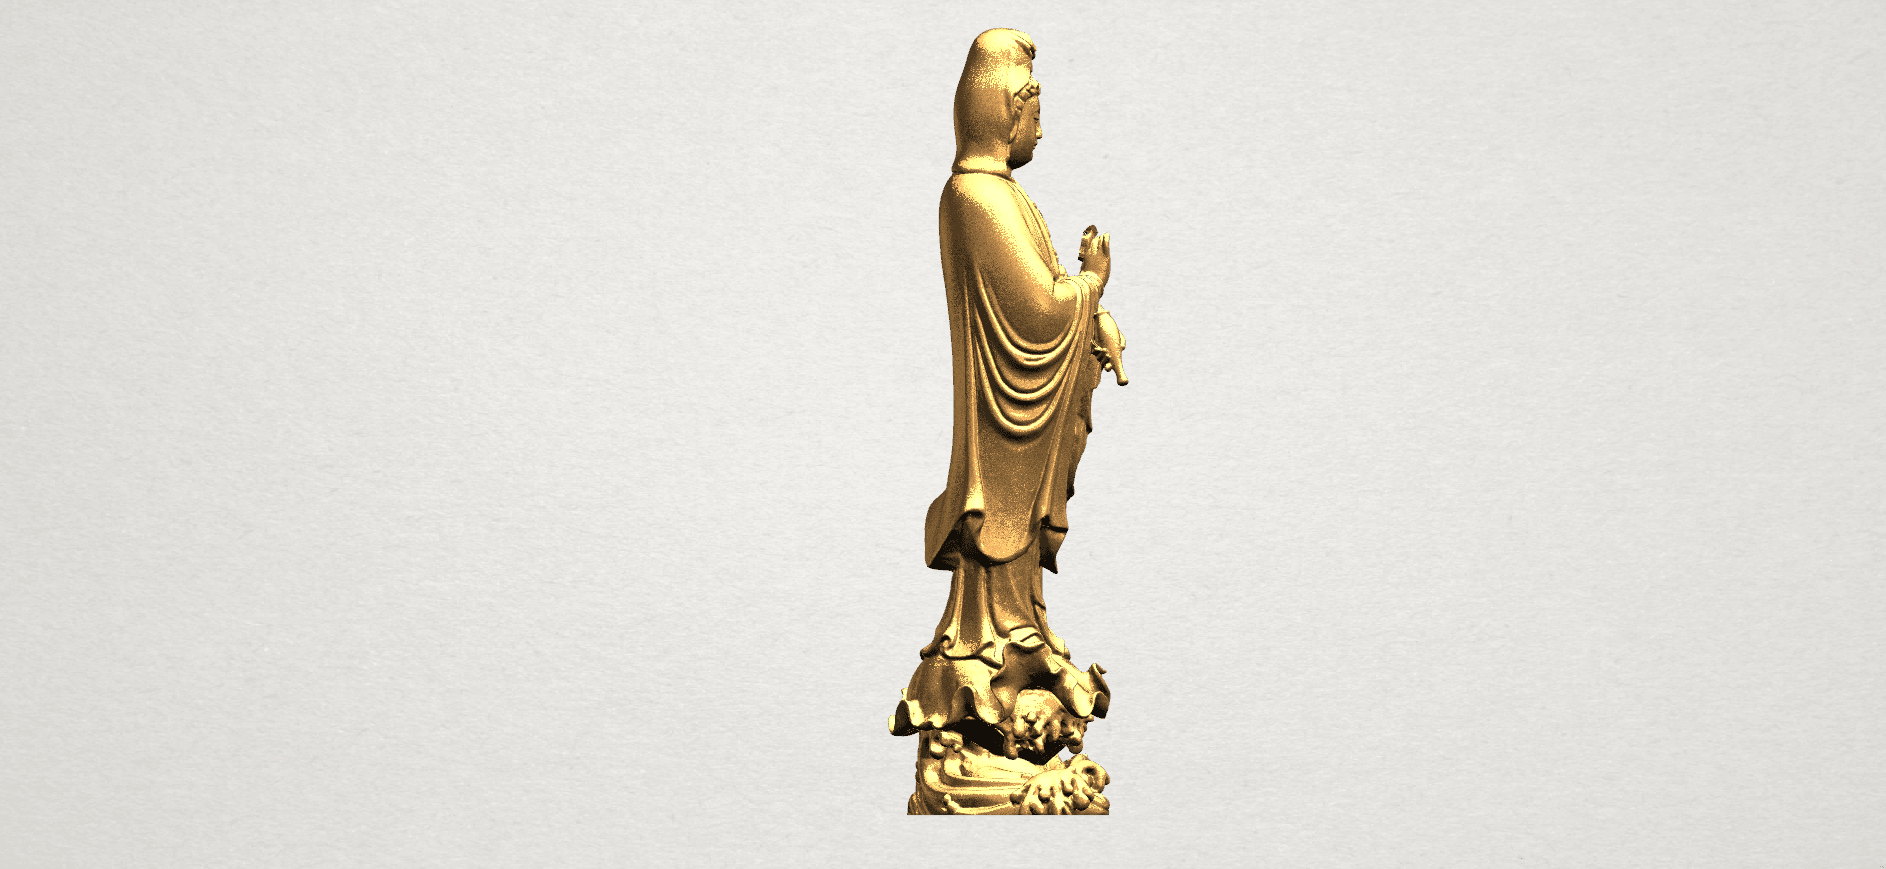 Avalokitesvara Buddha - Standing (v) A08.png Download free STL file Avalokitesvara Buddha - Standing 05 • 3D printer template, GeorgesNikkei